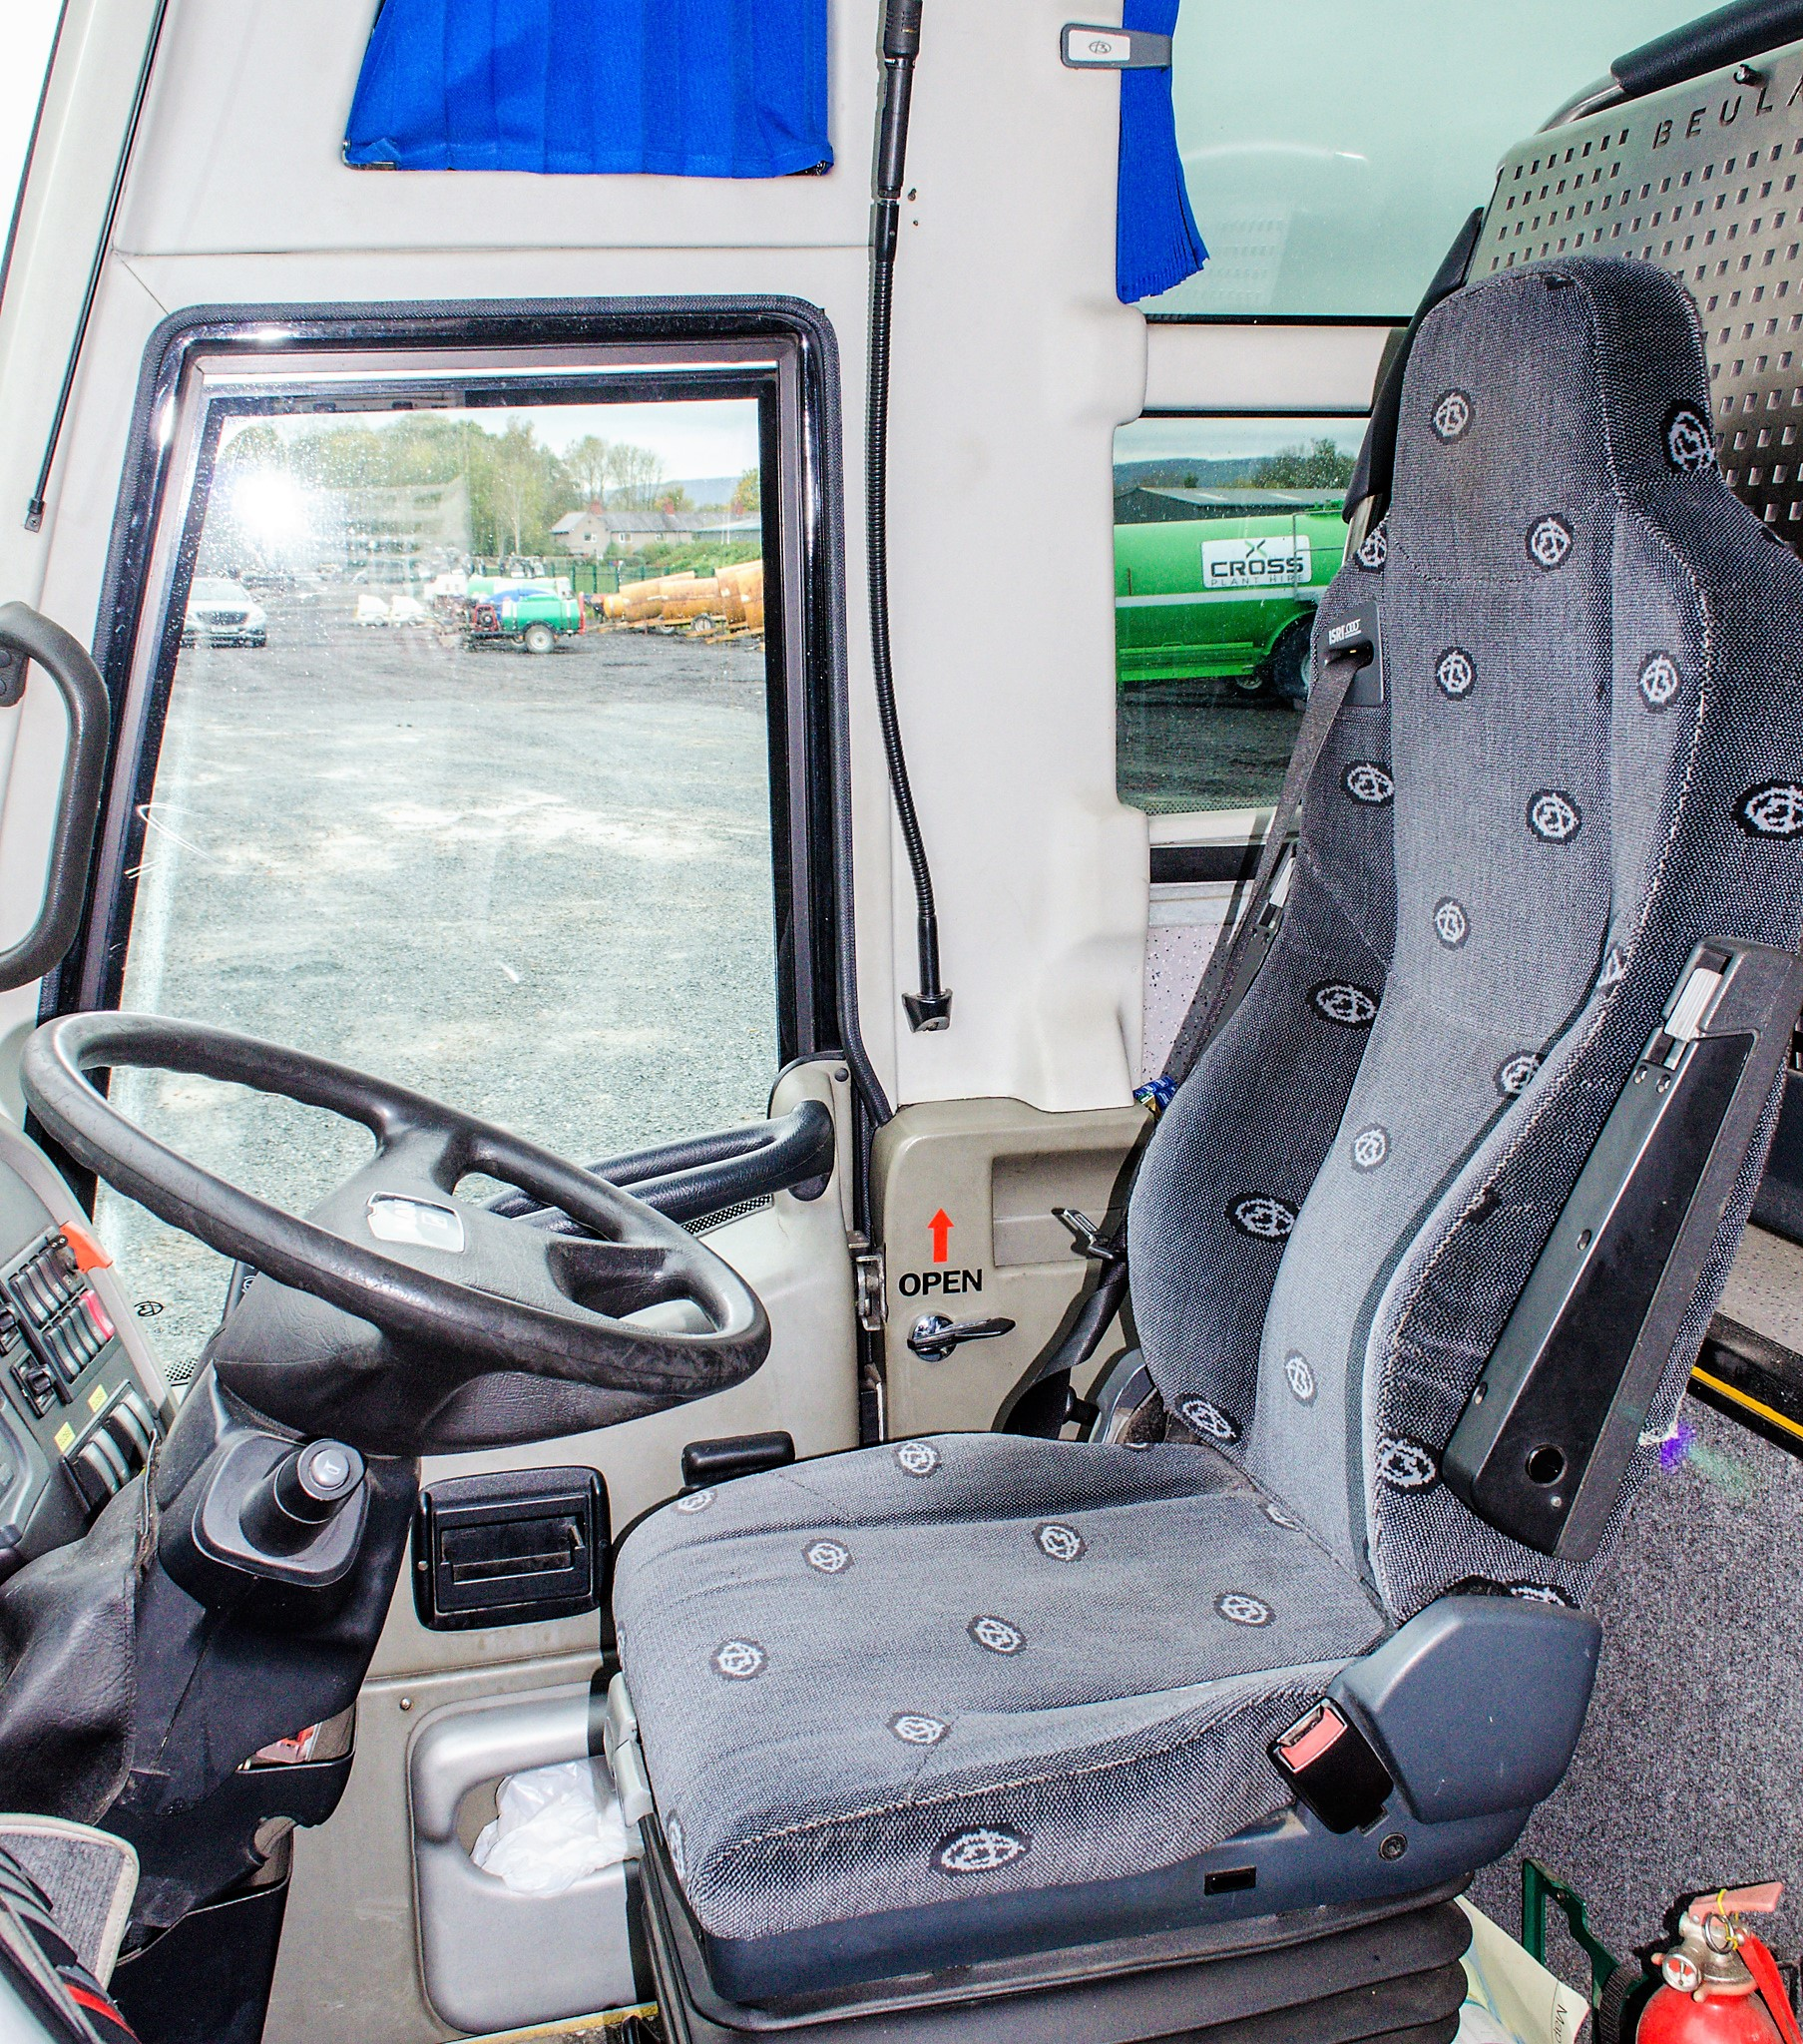 MAN F2000 Beulas Aura 54 seat luxury coach Registration Number: KC08 KTC Date of Registration: 30/ - Image 18 of 19